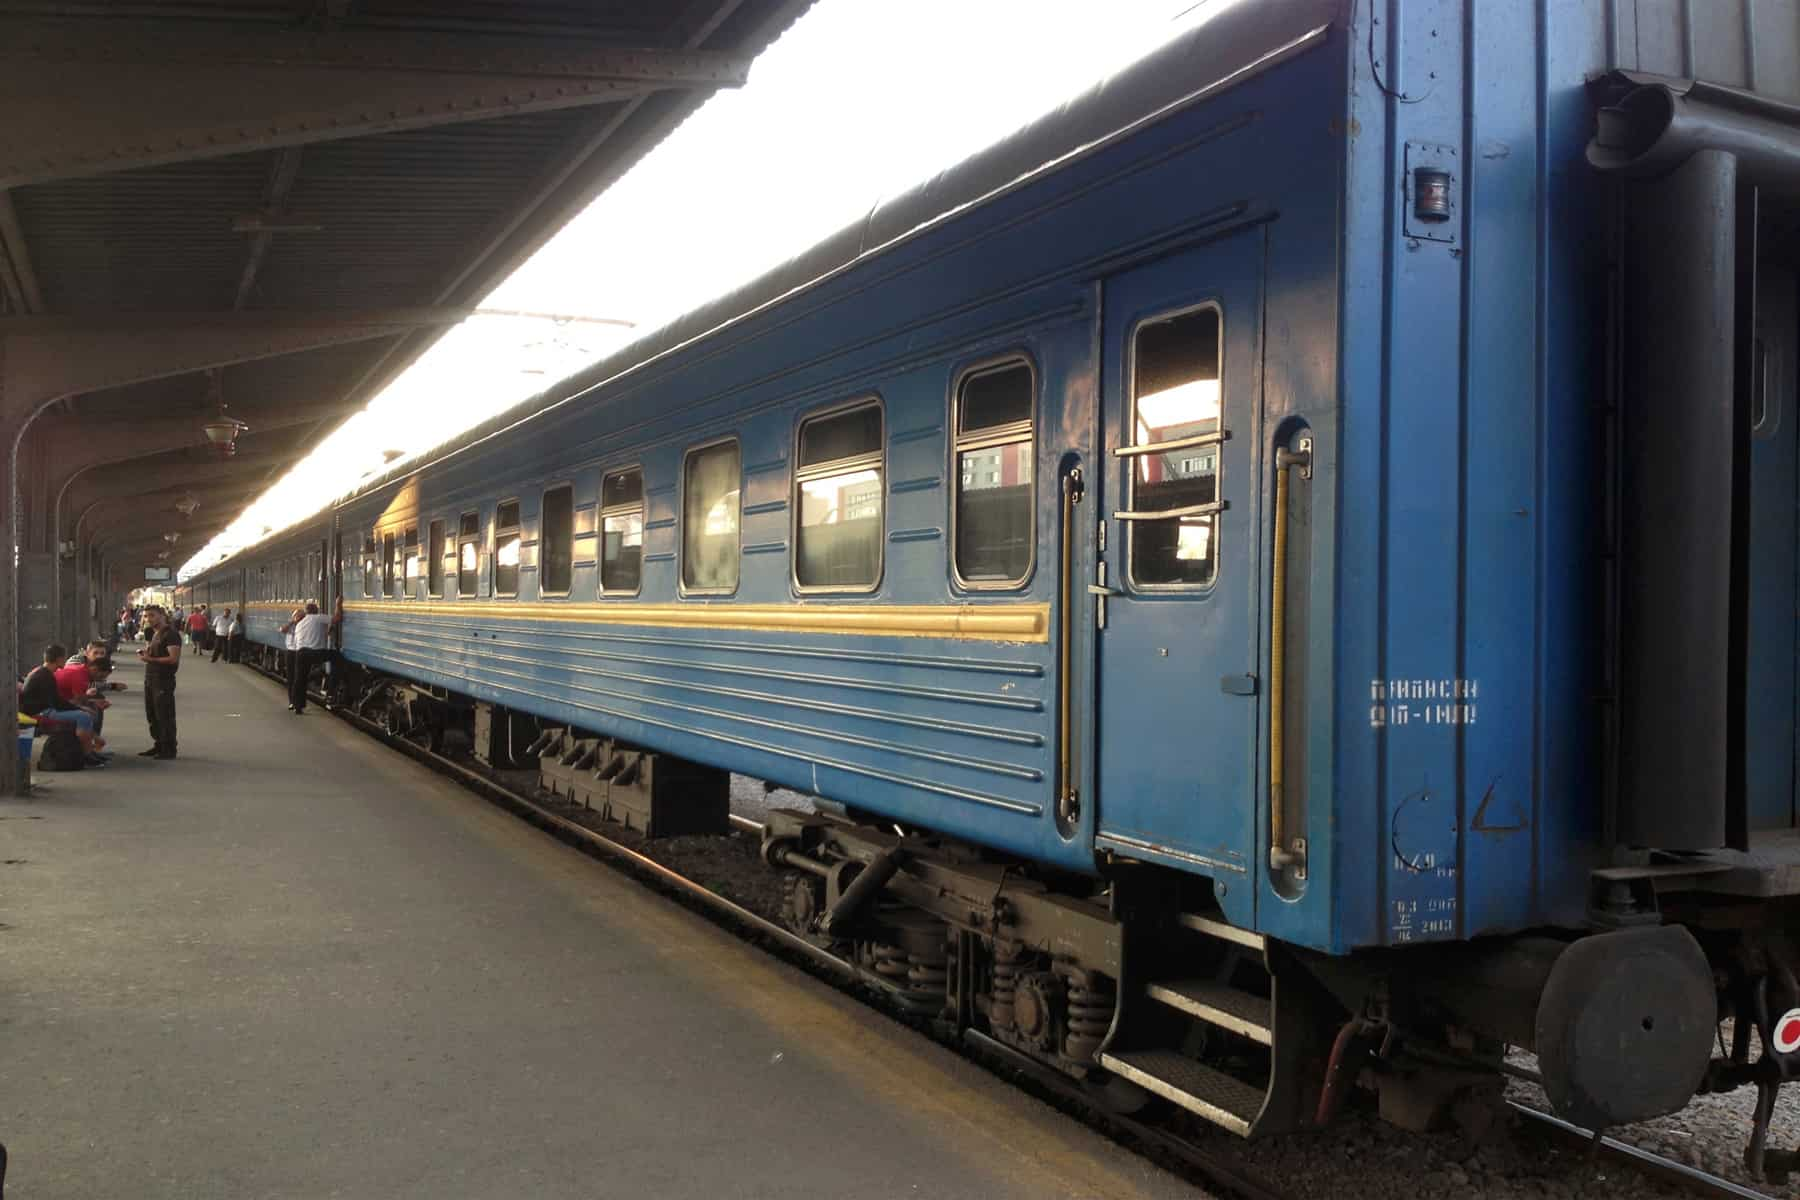 Blue train car sits beside the Bucharest train platform.